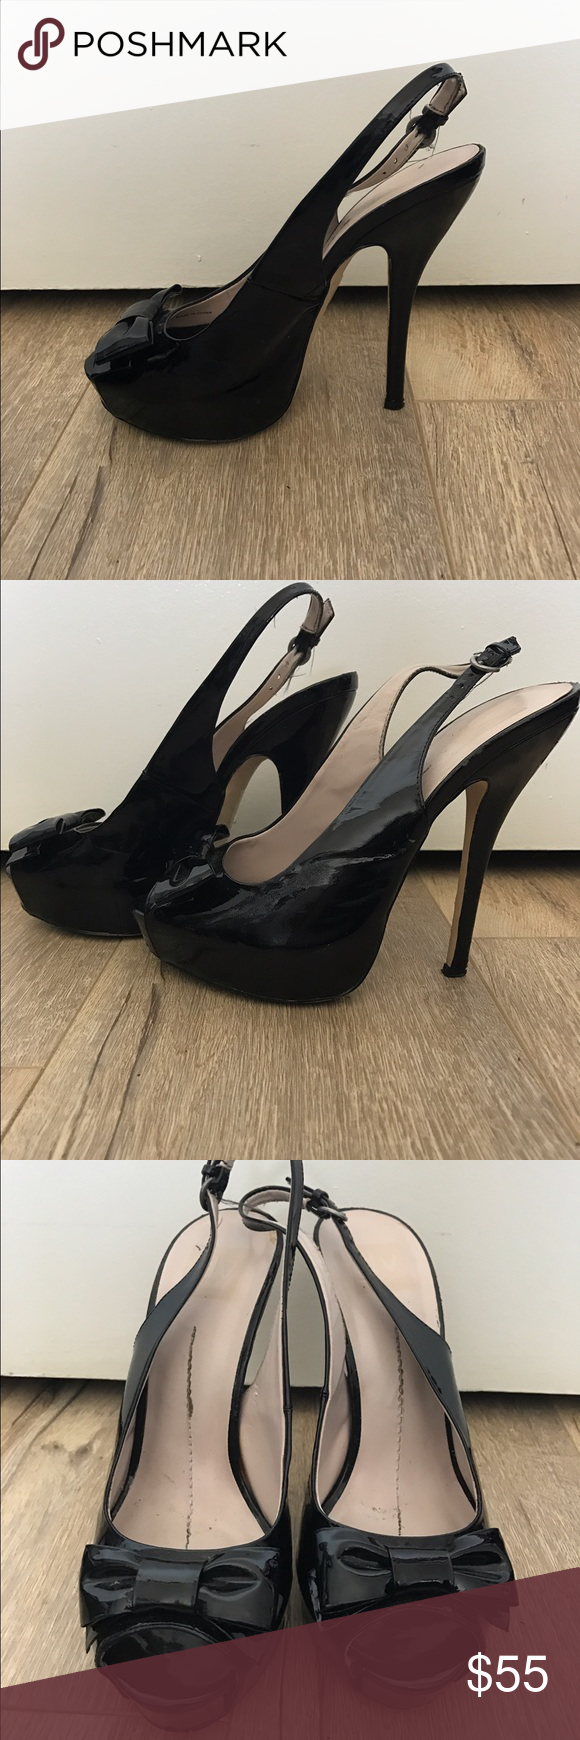 60 S Style Peep Toes 60s Fashion Black Peeptoe Dolce Vita Shoes